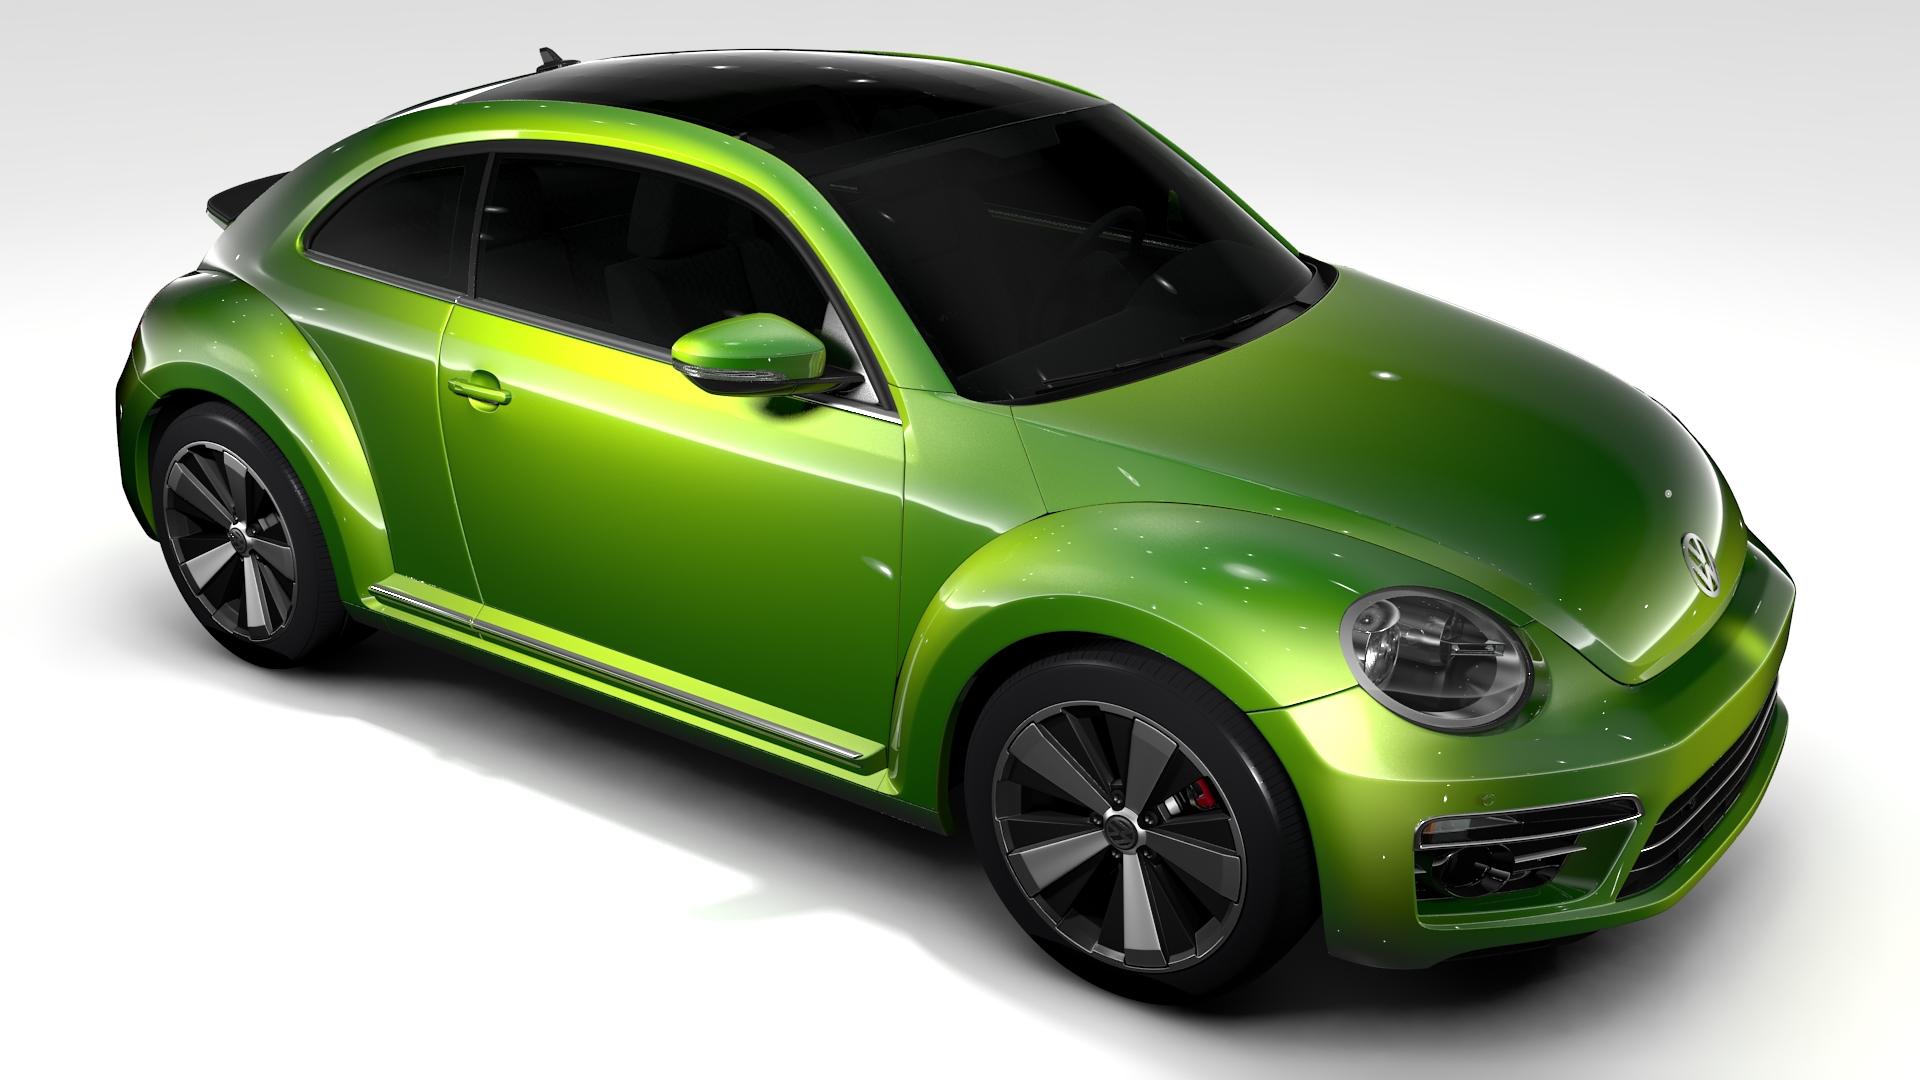 vw beetle 2017 by creator 3d 3docean. Black Bedroom Furniture Sets. Home Design Ideas